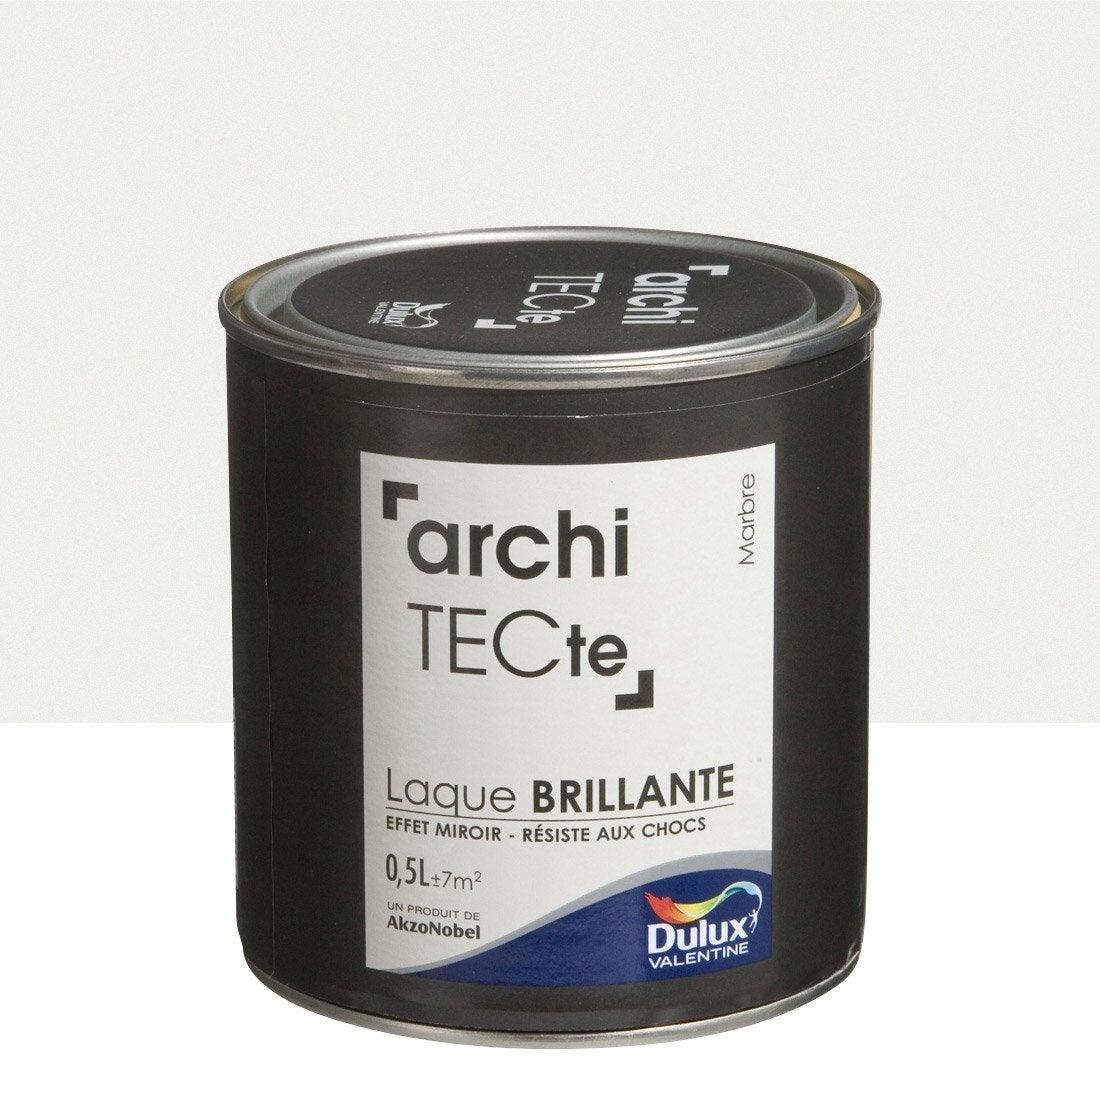 peinture boiserie architecte dulux valentine marbre brillant 0 5l leroy merlin. Black Bedroom Furniture Sets. Home Design Ideas